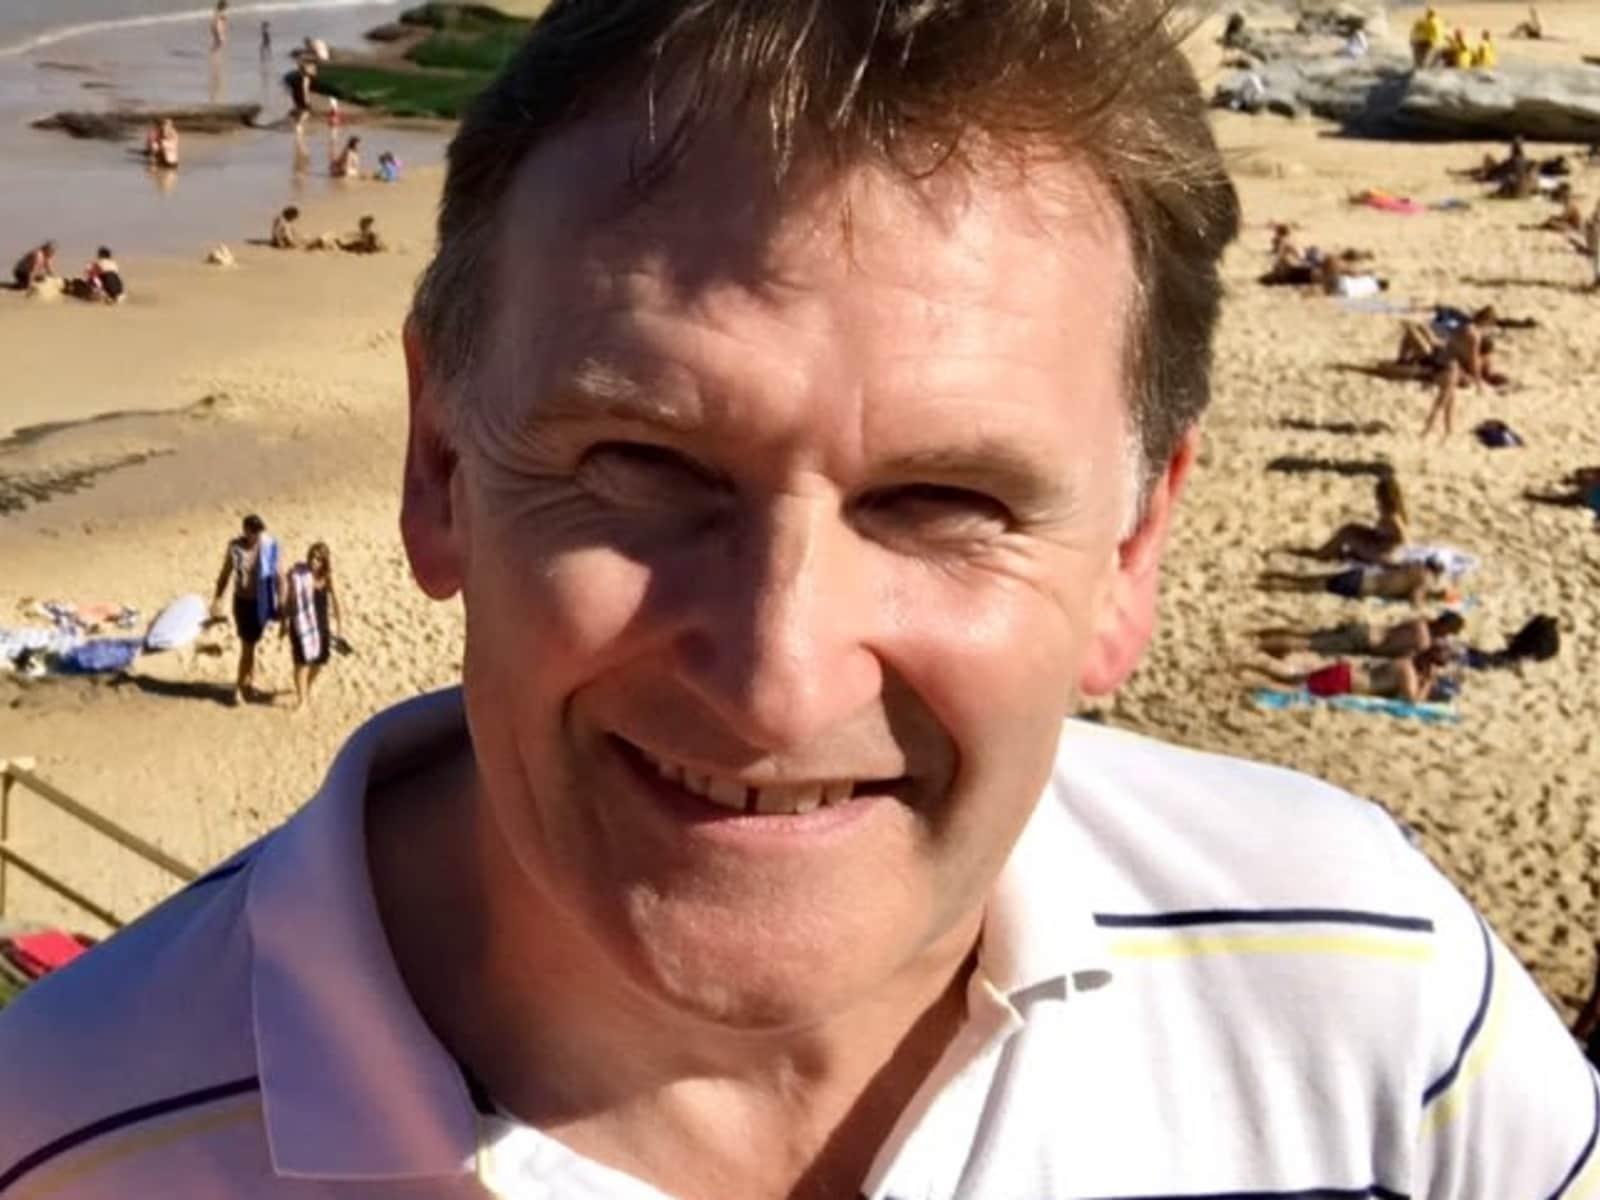 Tim from Melbourne, Victoria, Australia